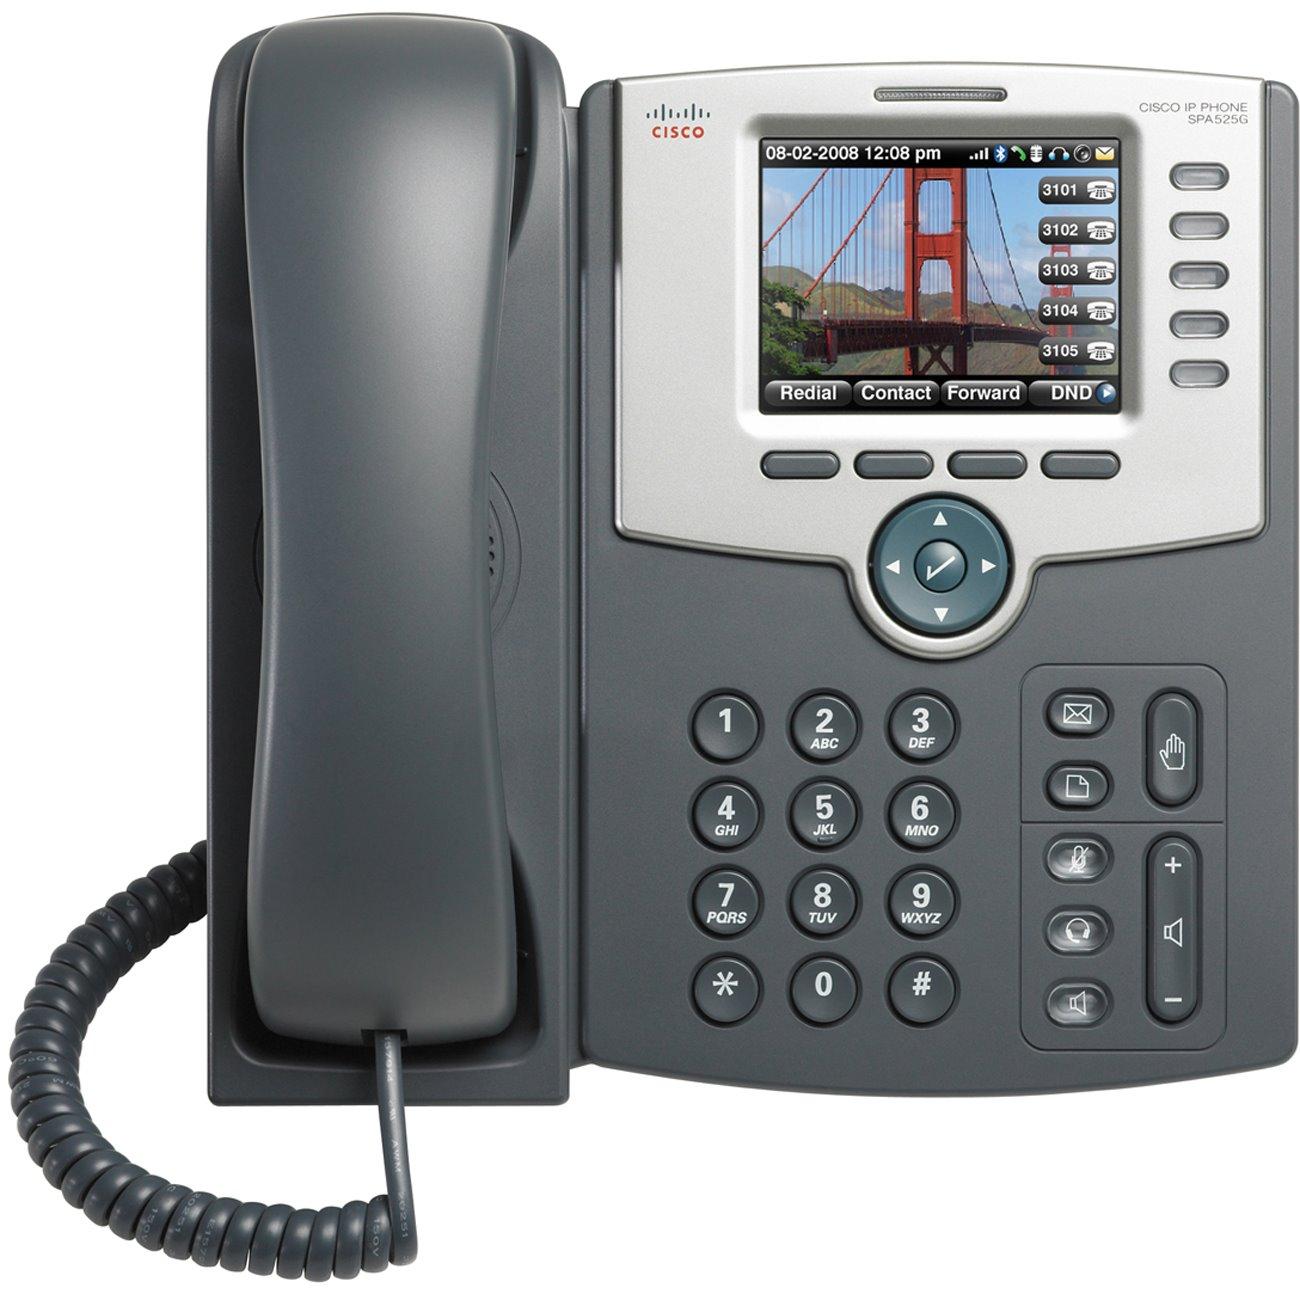 Cisco SPA525G2 IP Phone - Wi-Fi